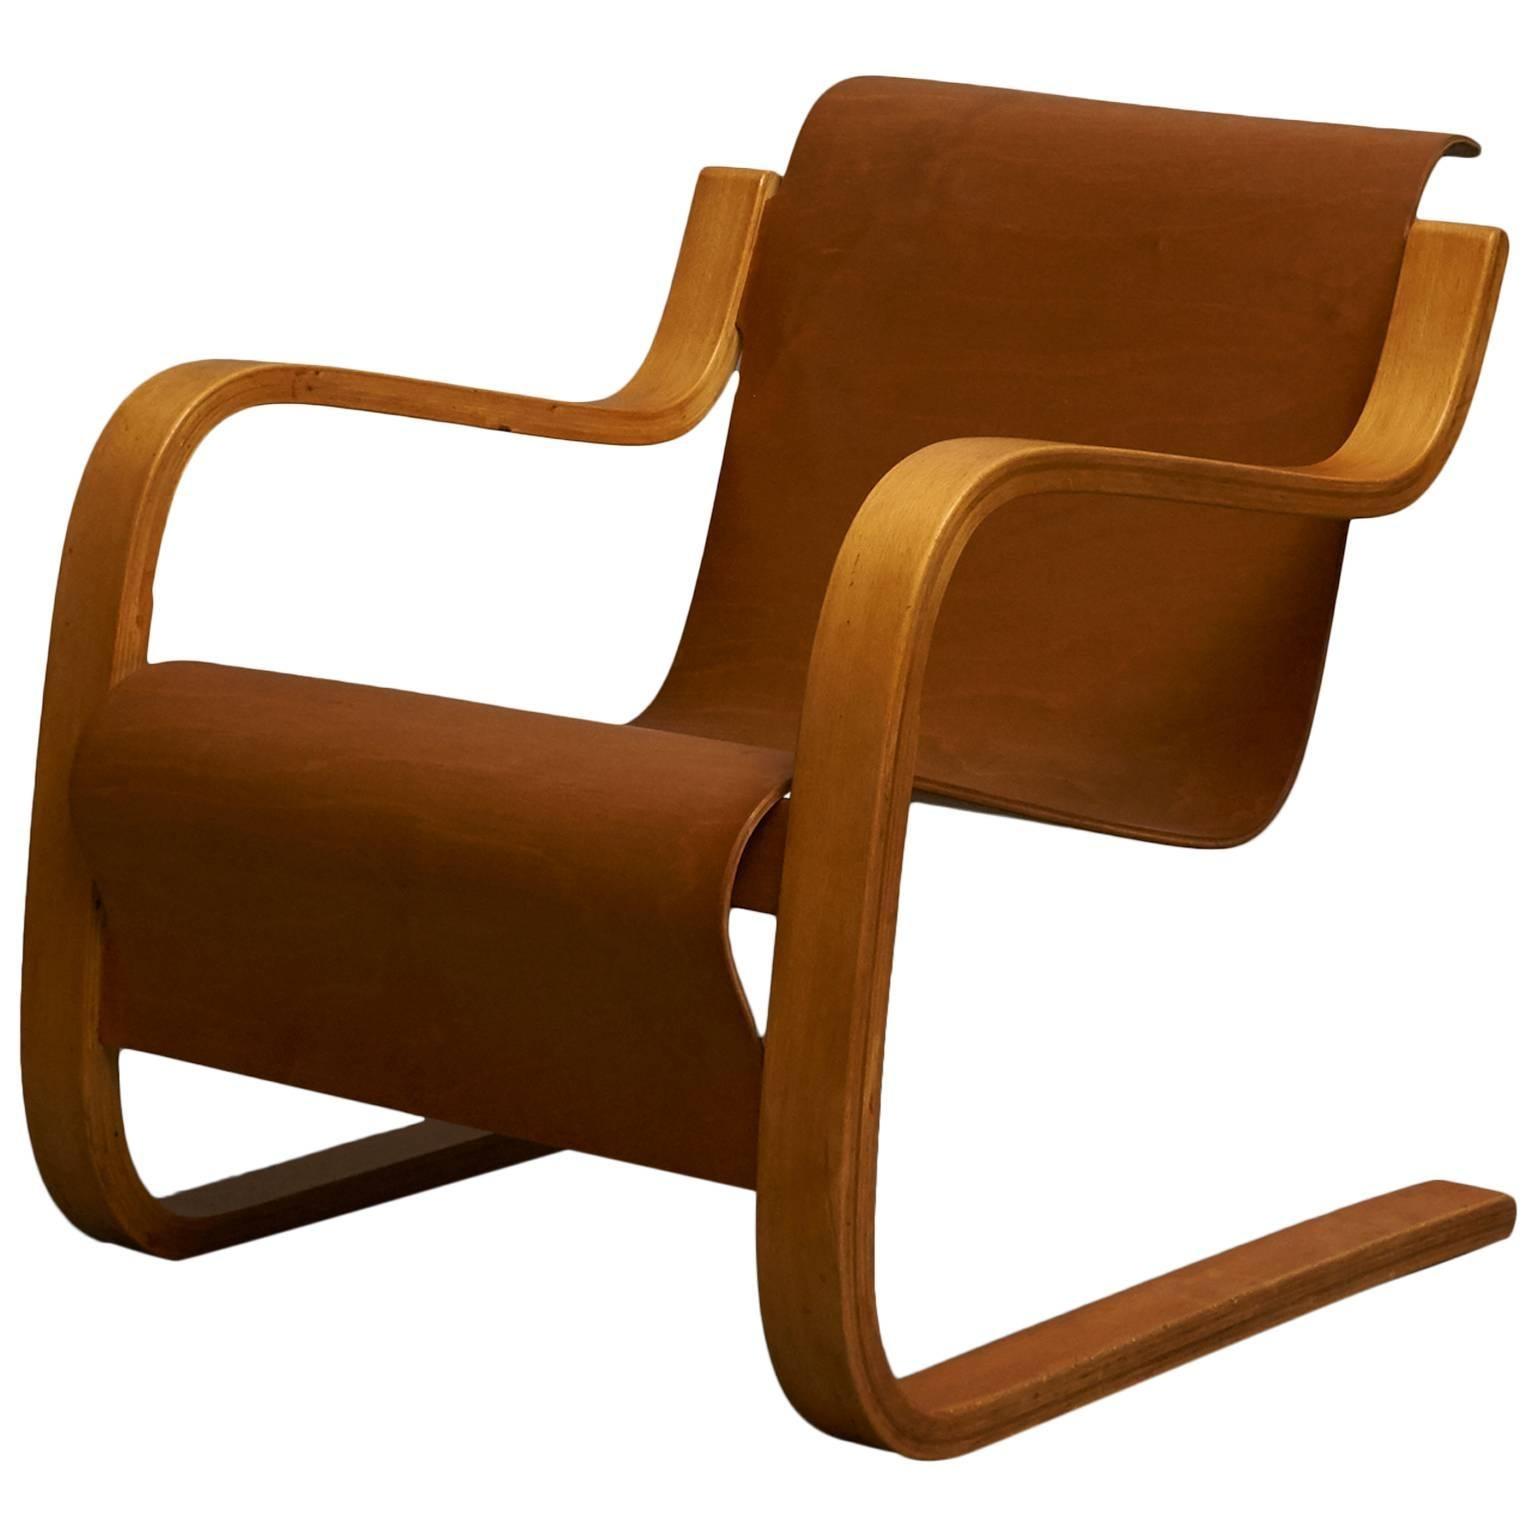 Alvar Aalto Cantilever Chair, Model 31